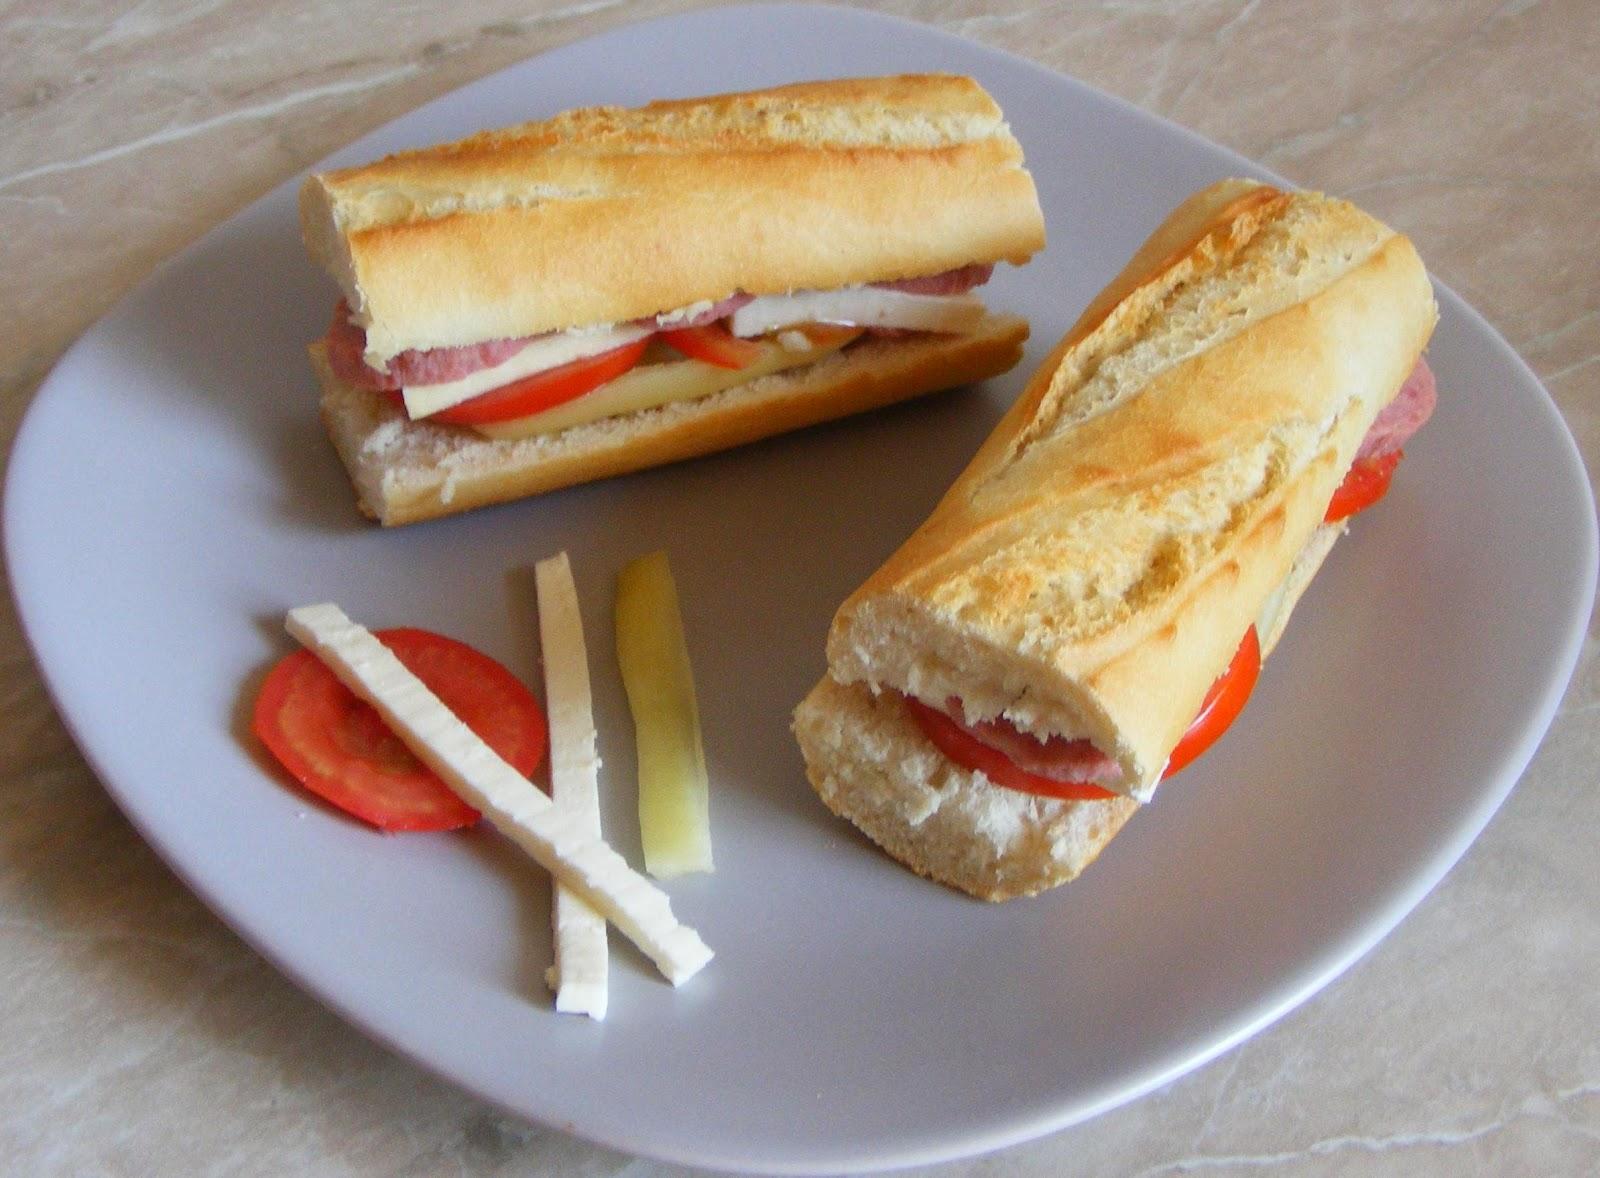 sandwich, sandwich din bagheta cu crenvursti, sandvis, sandvici, sendvici, sandwichuri, sandwich-uri, retete de mancare, retete mancare, gustari, gustare, retete rapide, retete usoare, sandwich retete, retete culinare, preparate culinare, retete mic dejun, reteta hot dog, reteta sandwich,